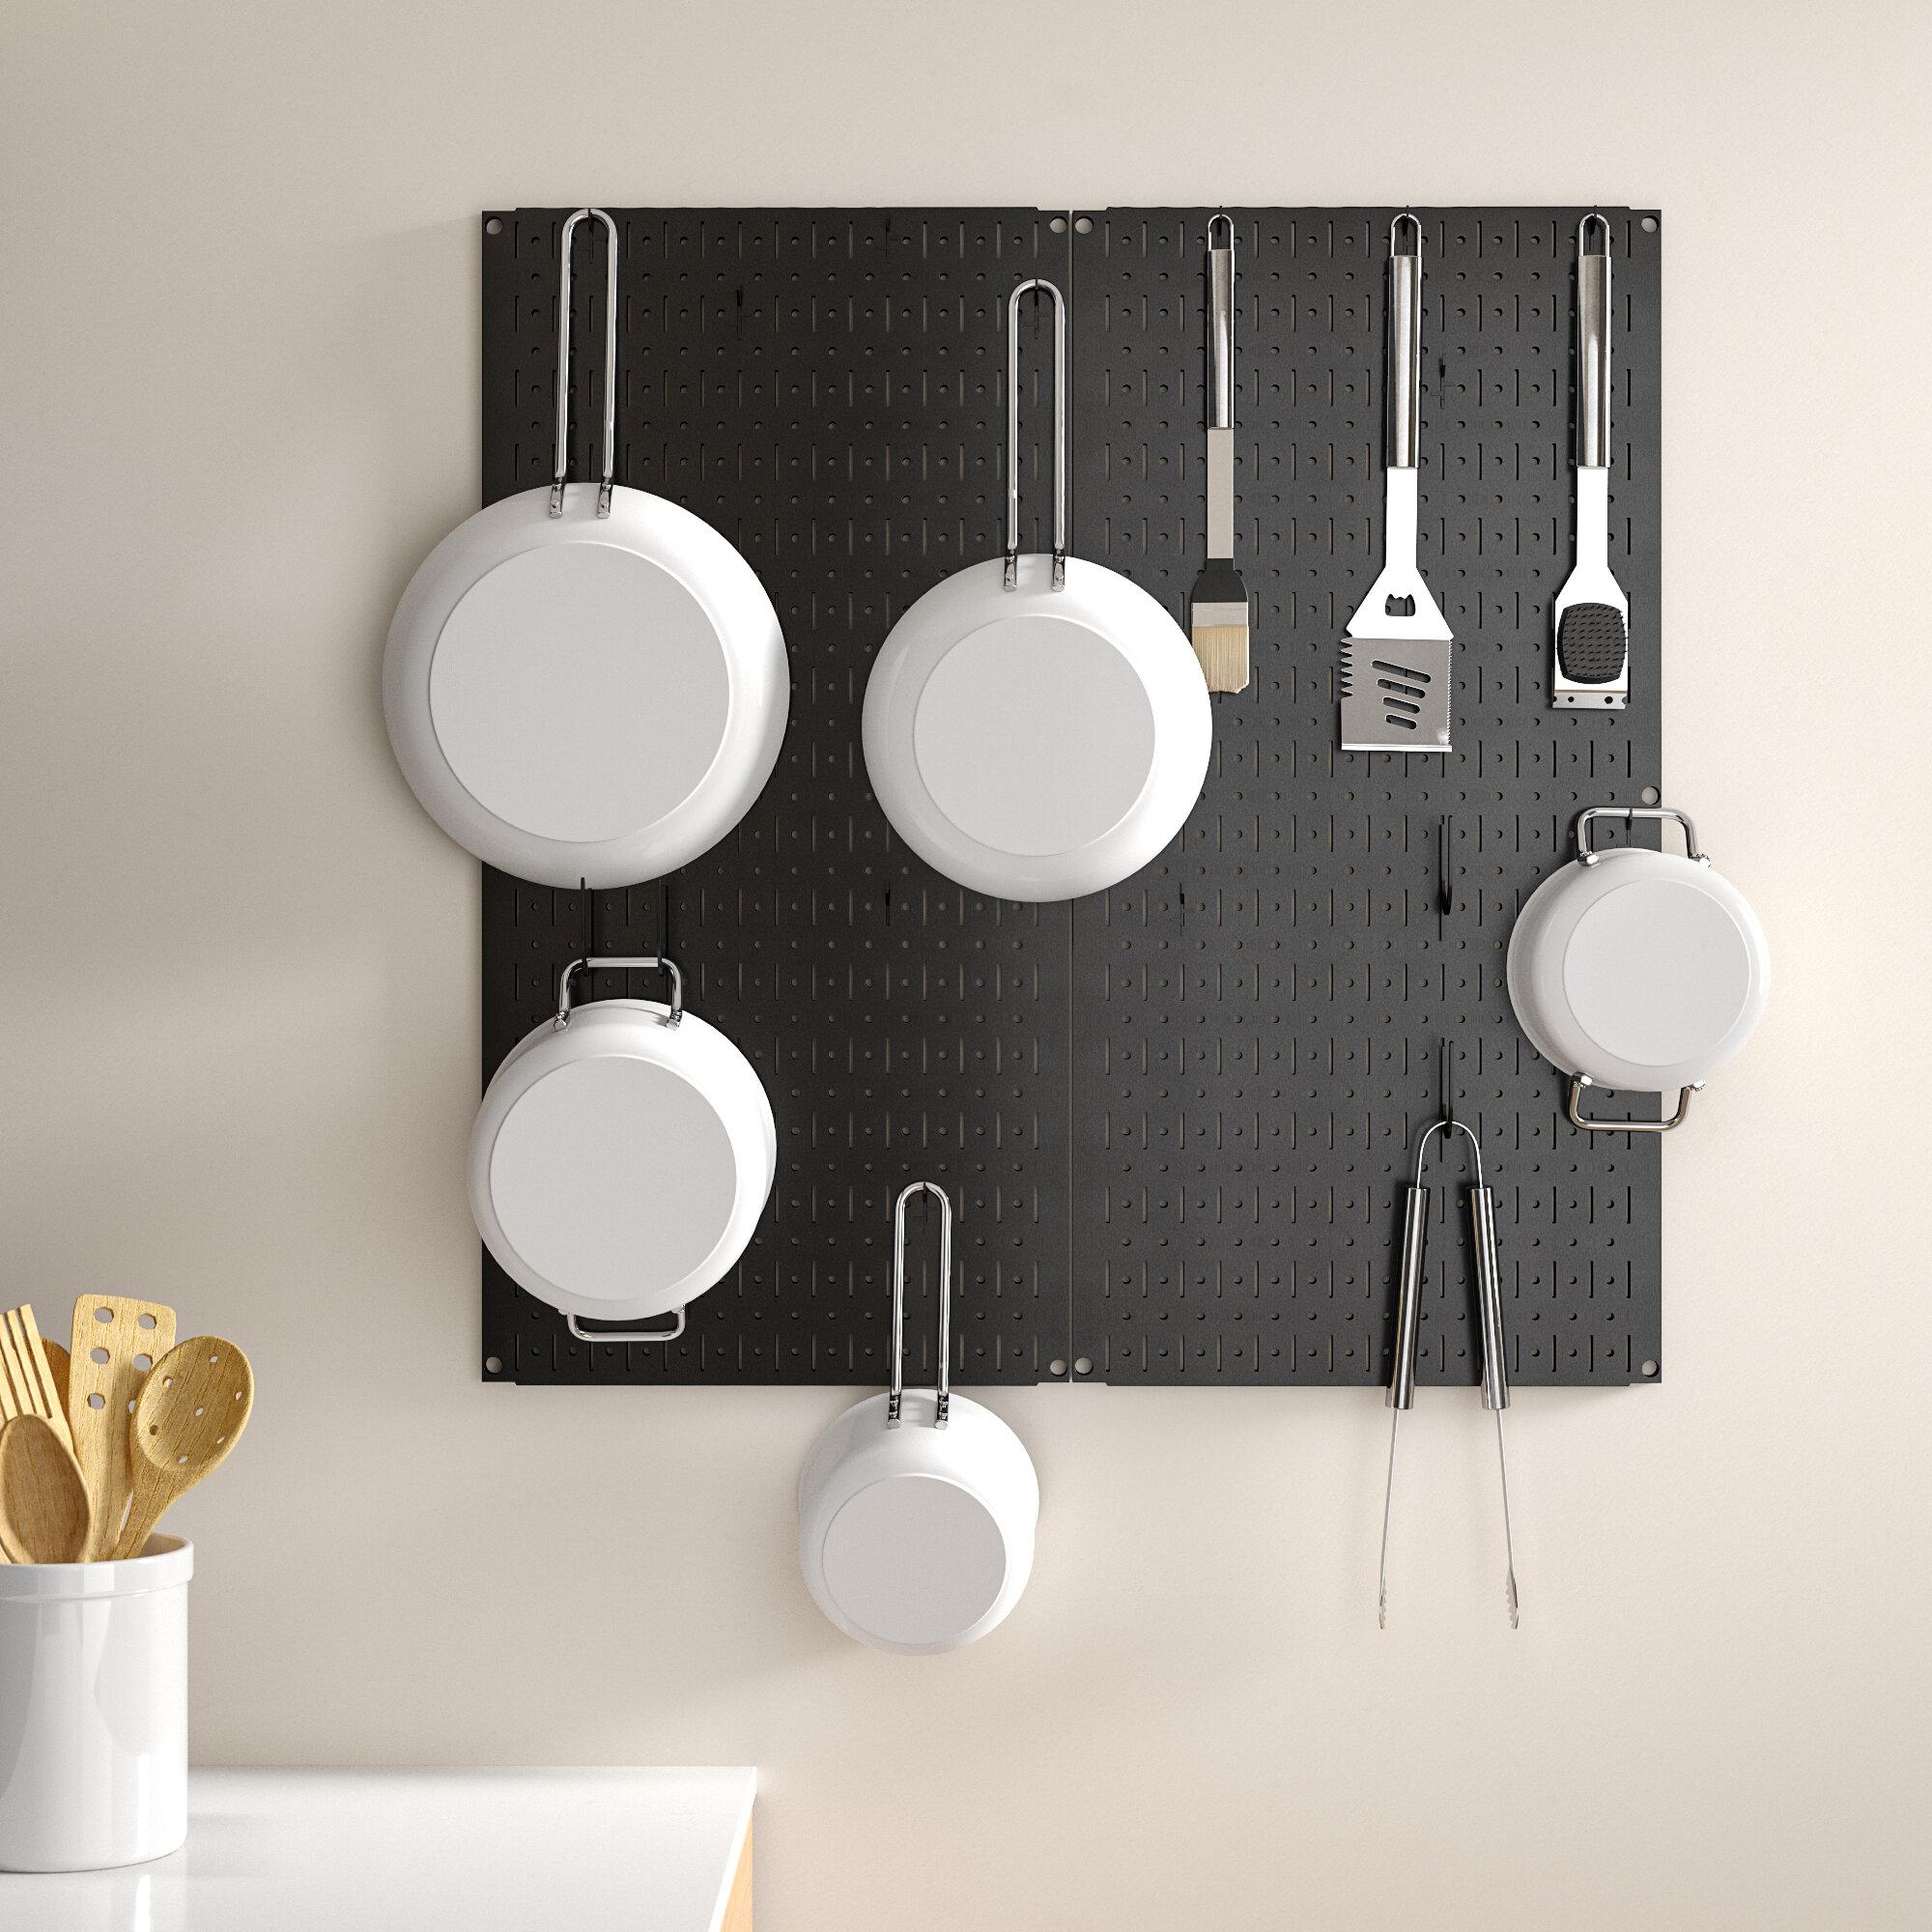 Dotted Line Kitchen Organizer Pots Pans Pegboard Pack Reviews Wayfair